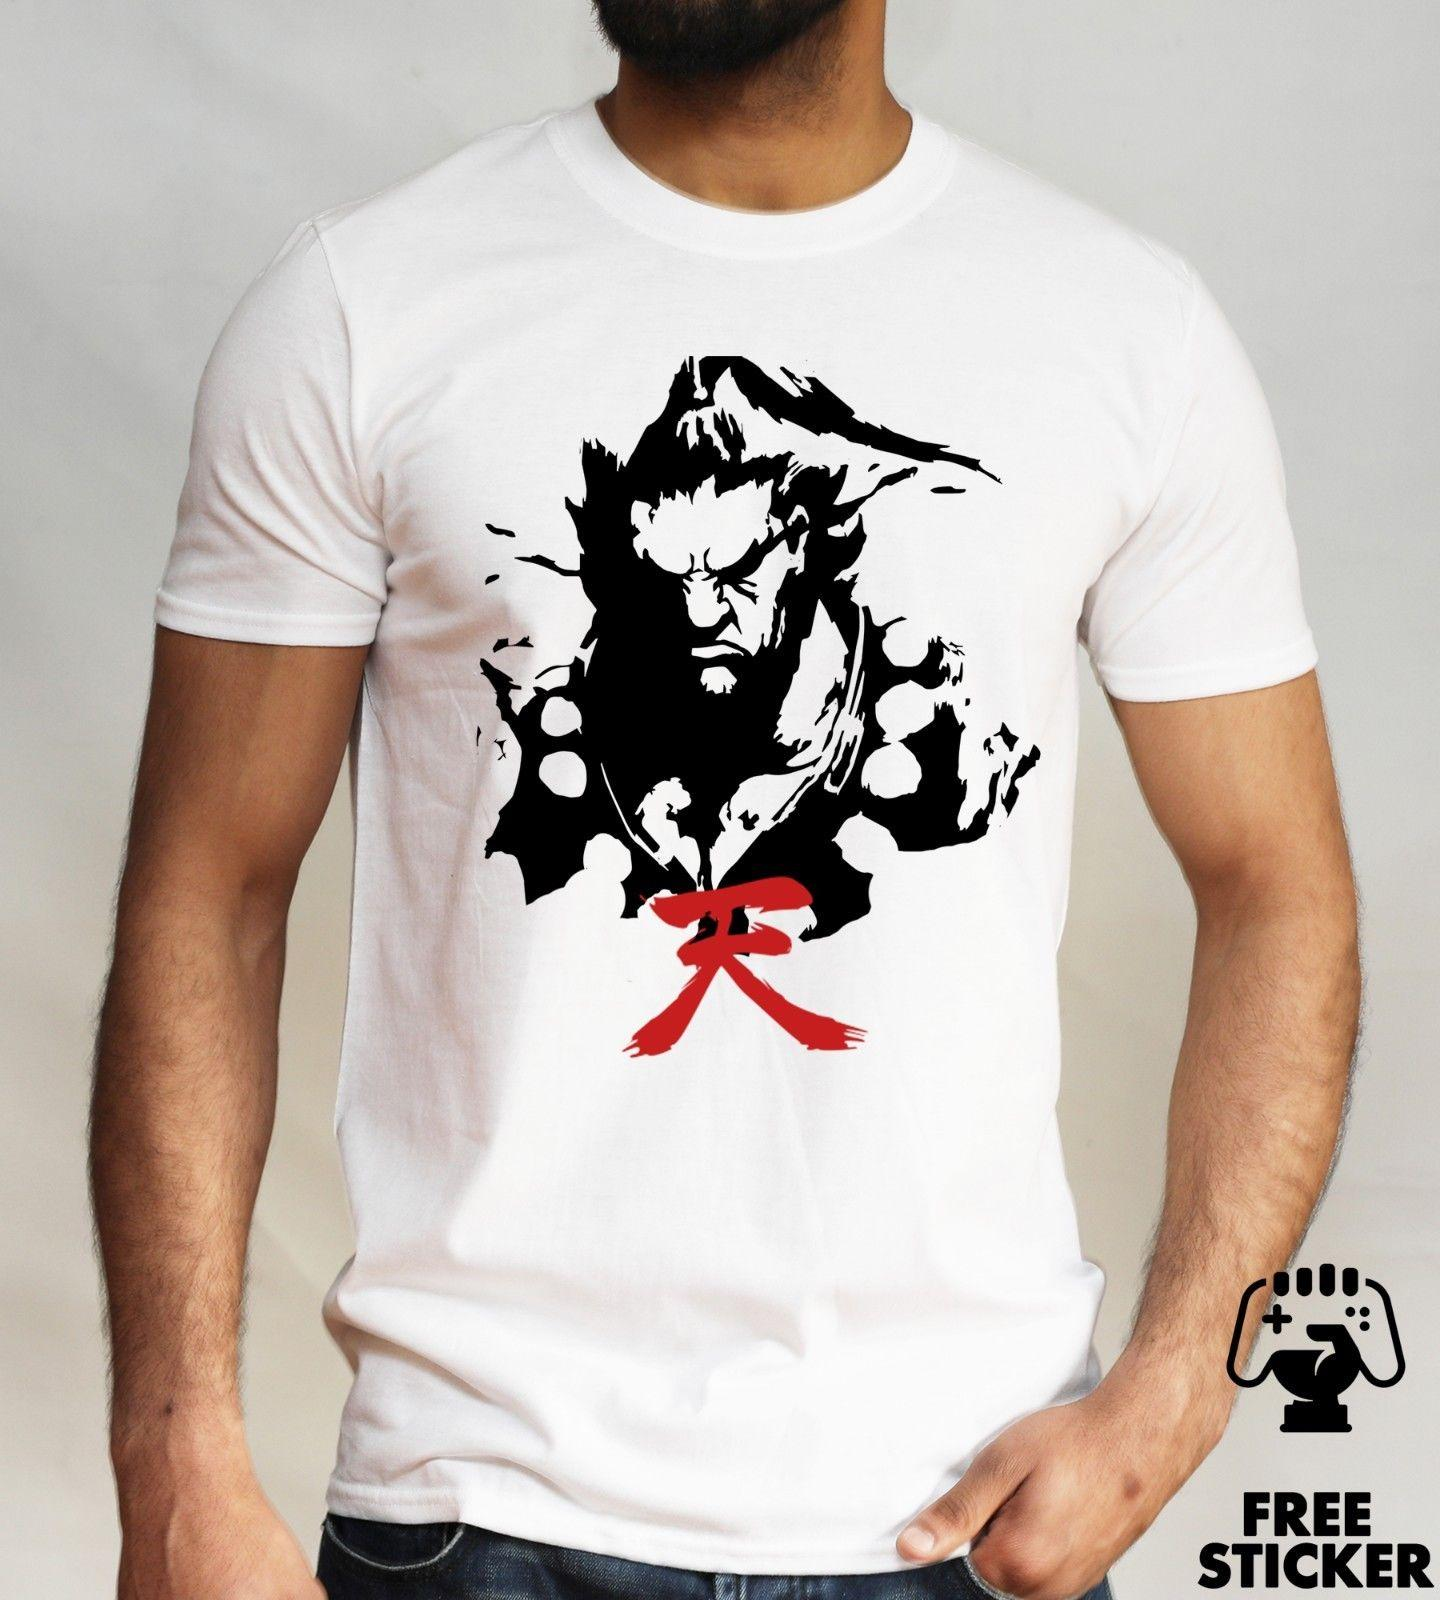 Akuma Japanese Kanji T Shirt Street Fighter Ryu Ken Retro Gamers Gift Top Mens Funny Unisex Casual Tee Gift Cool Shirt Design Tshirts Printed From Micky Tees 12 96 Dhgate Com